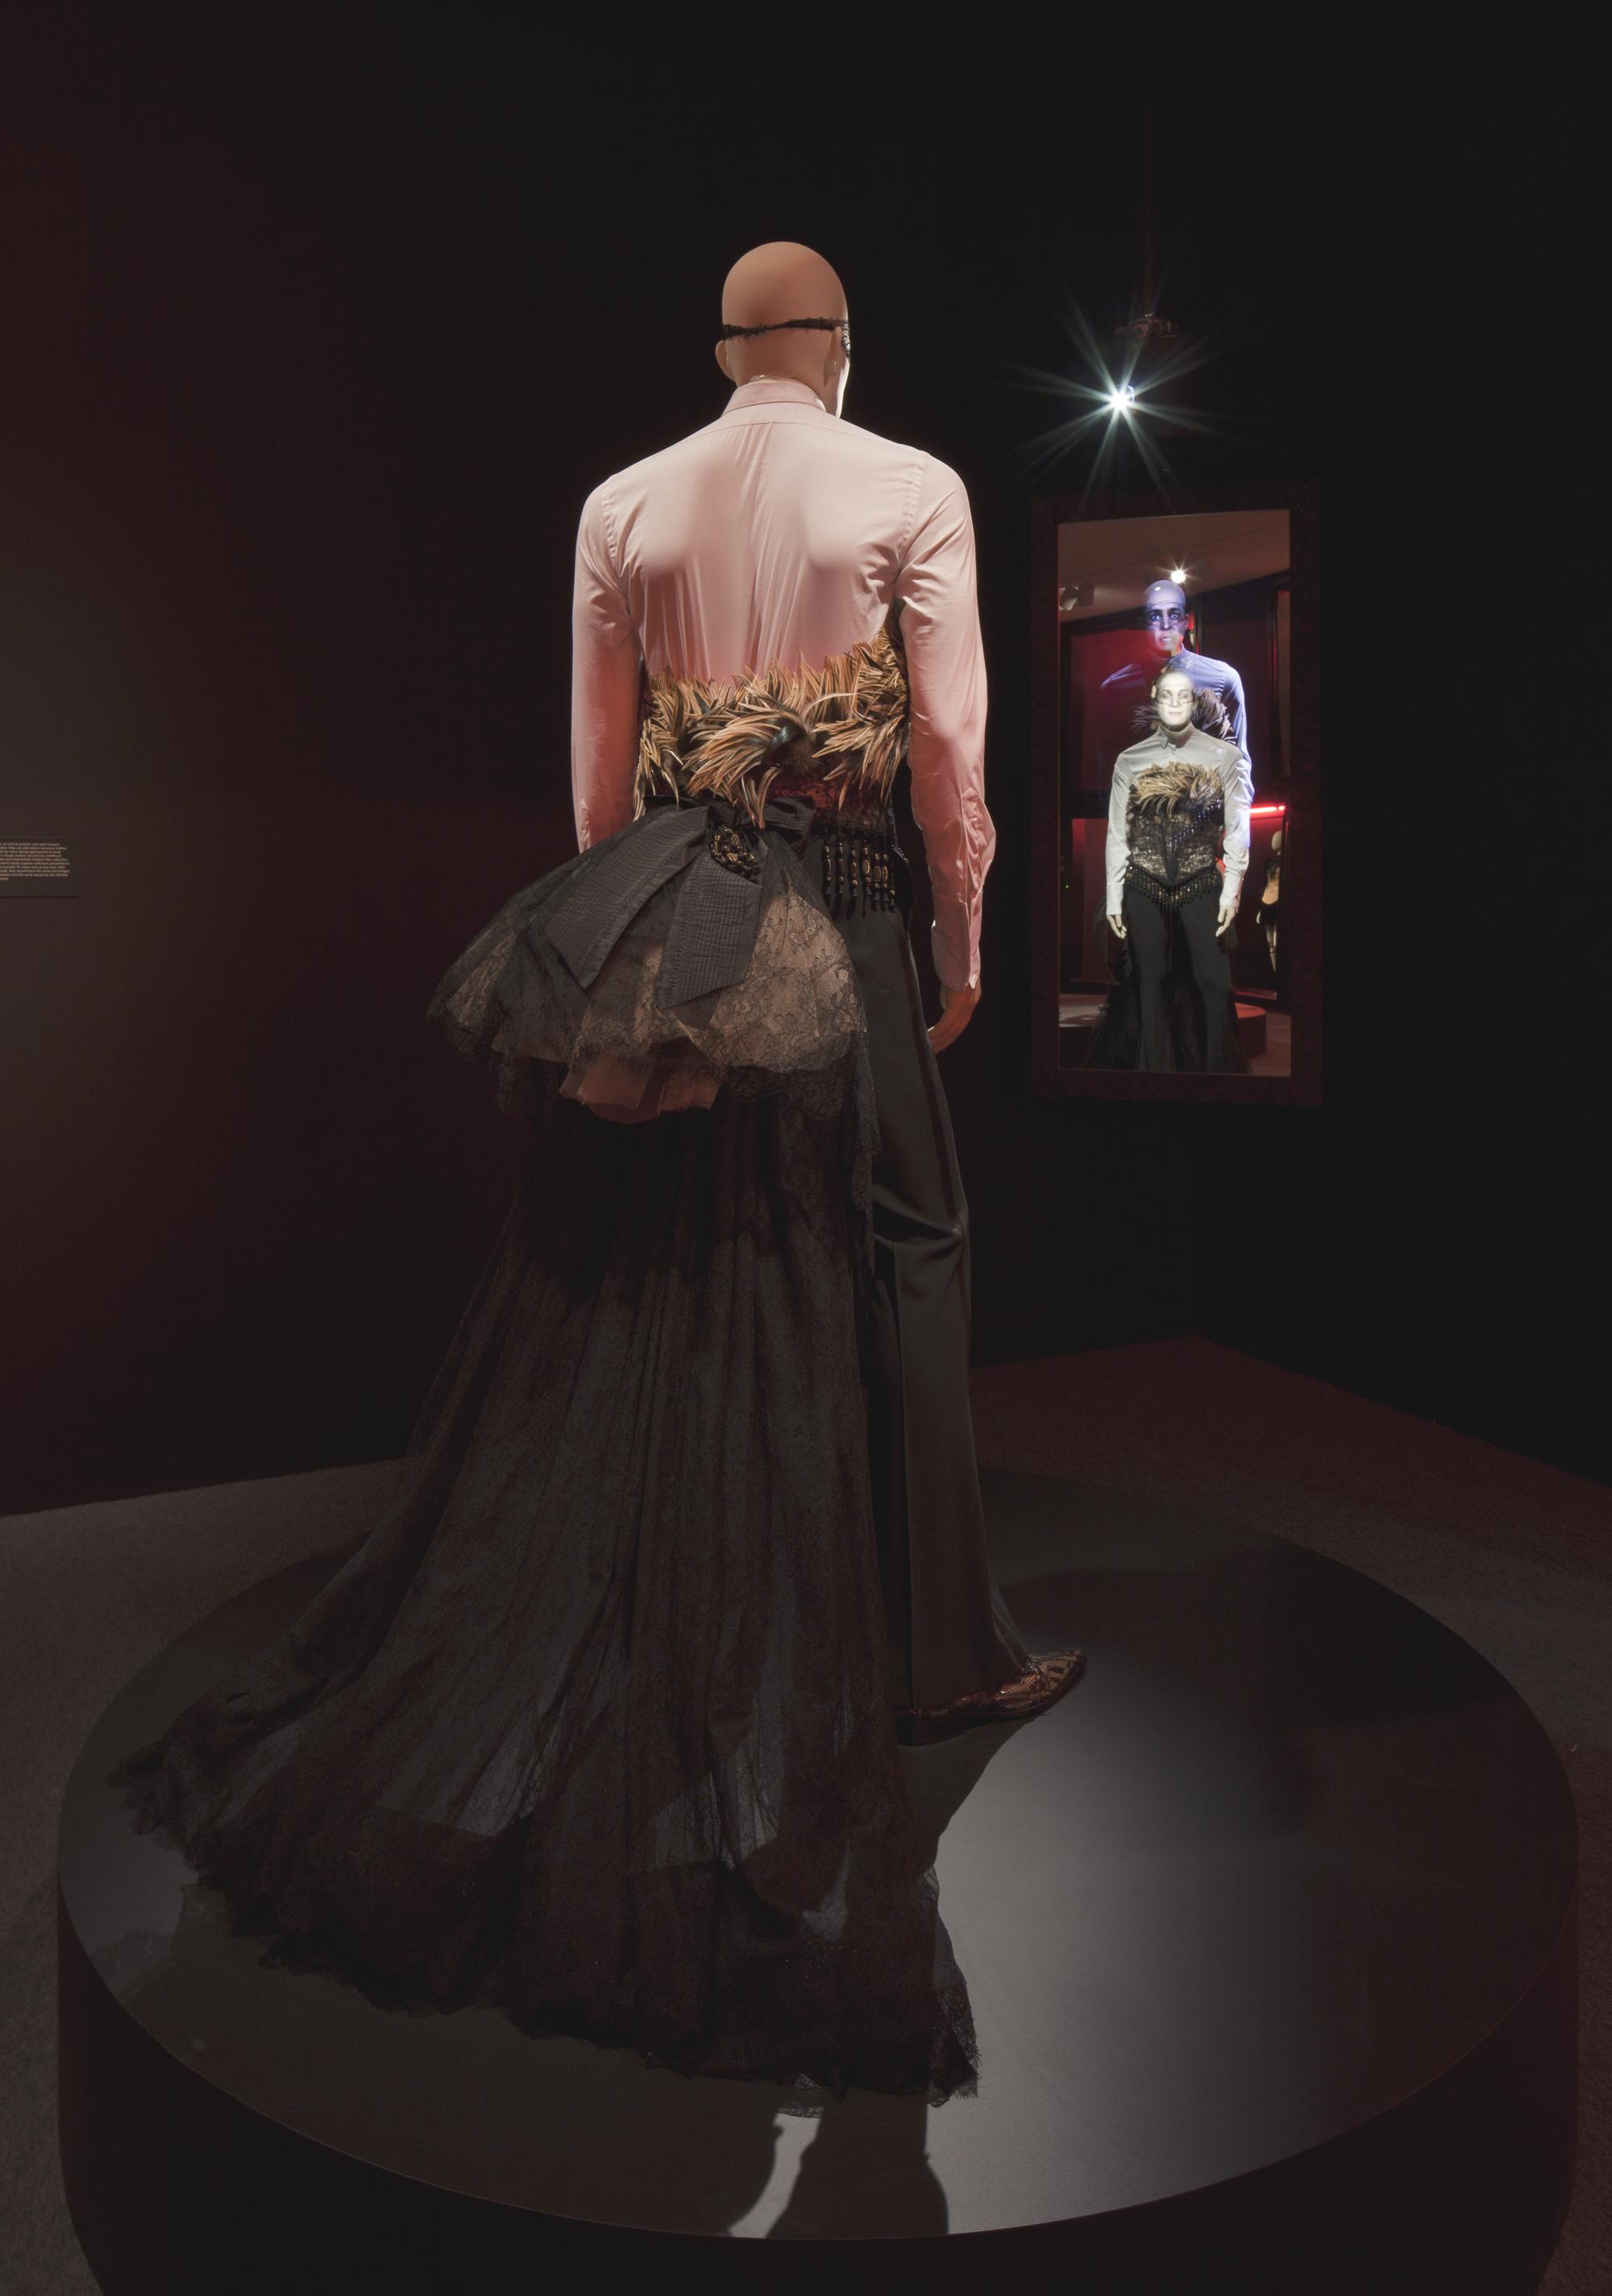 Fashion photographer nigel barker M: Photo Grid-Collage Maker: Appstore for